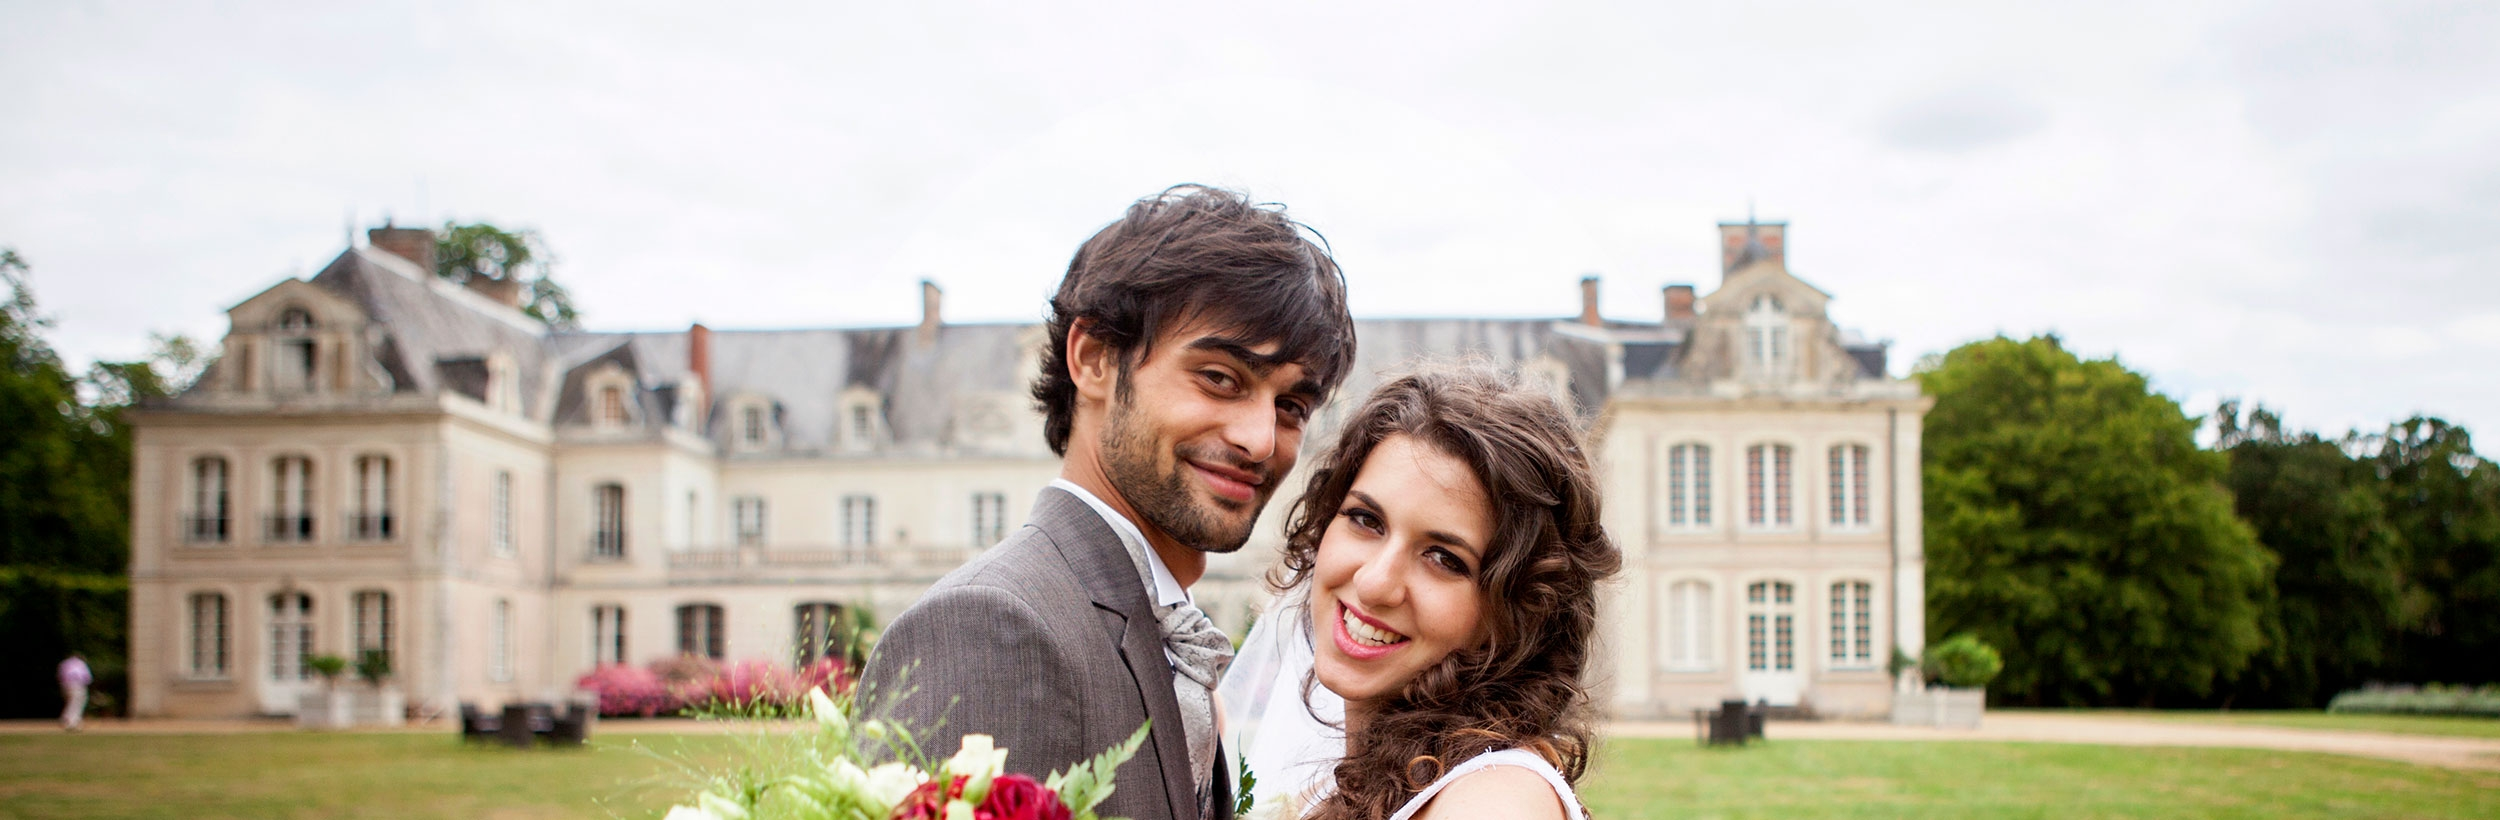 mariage-agnes-louis-pagetop